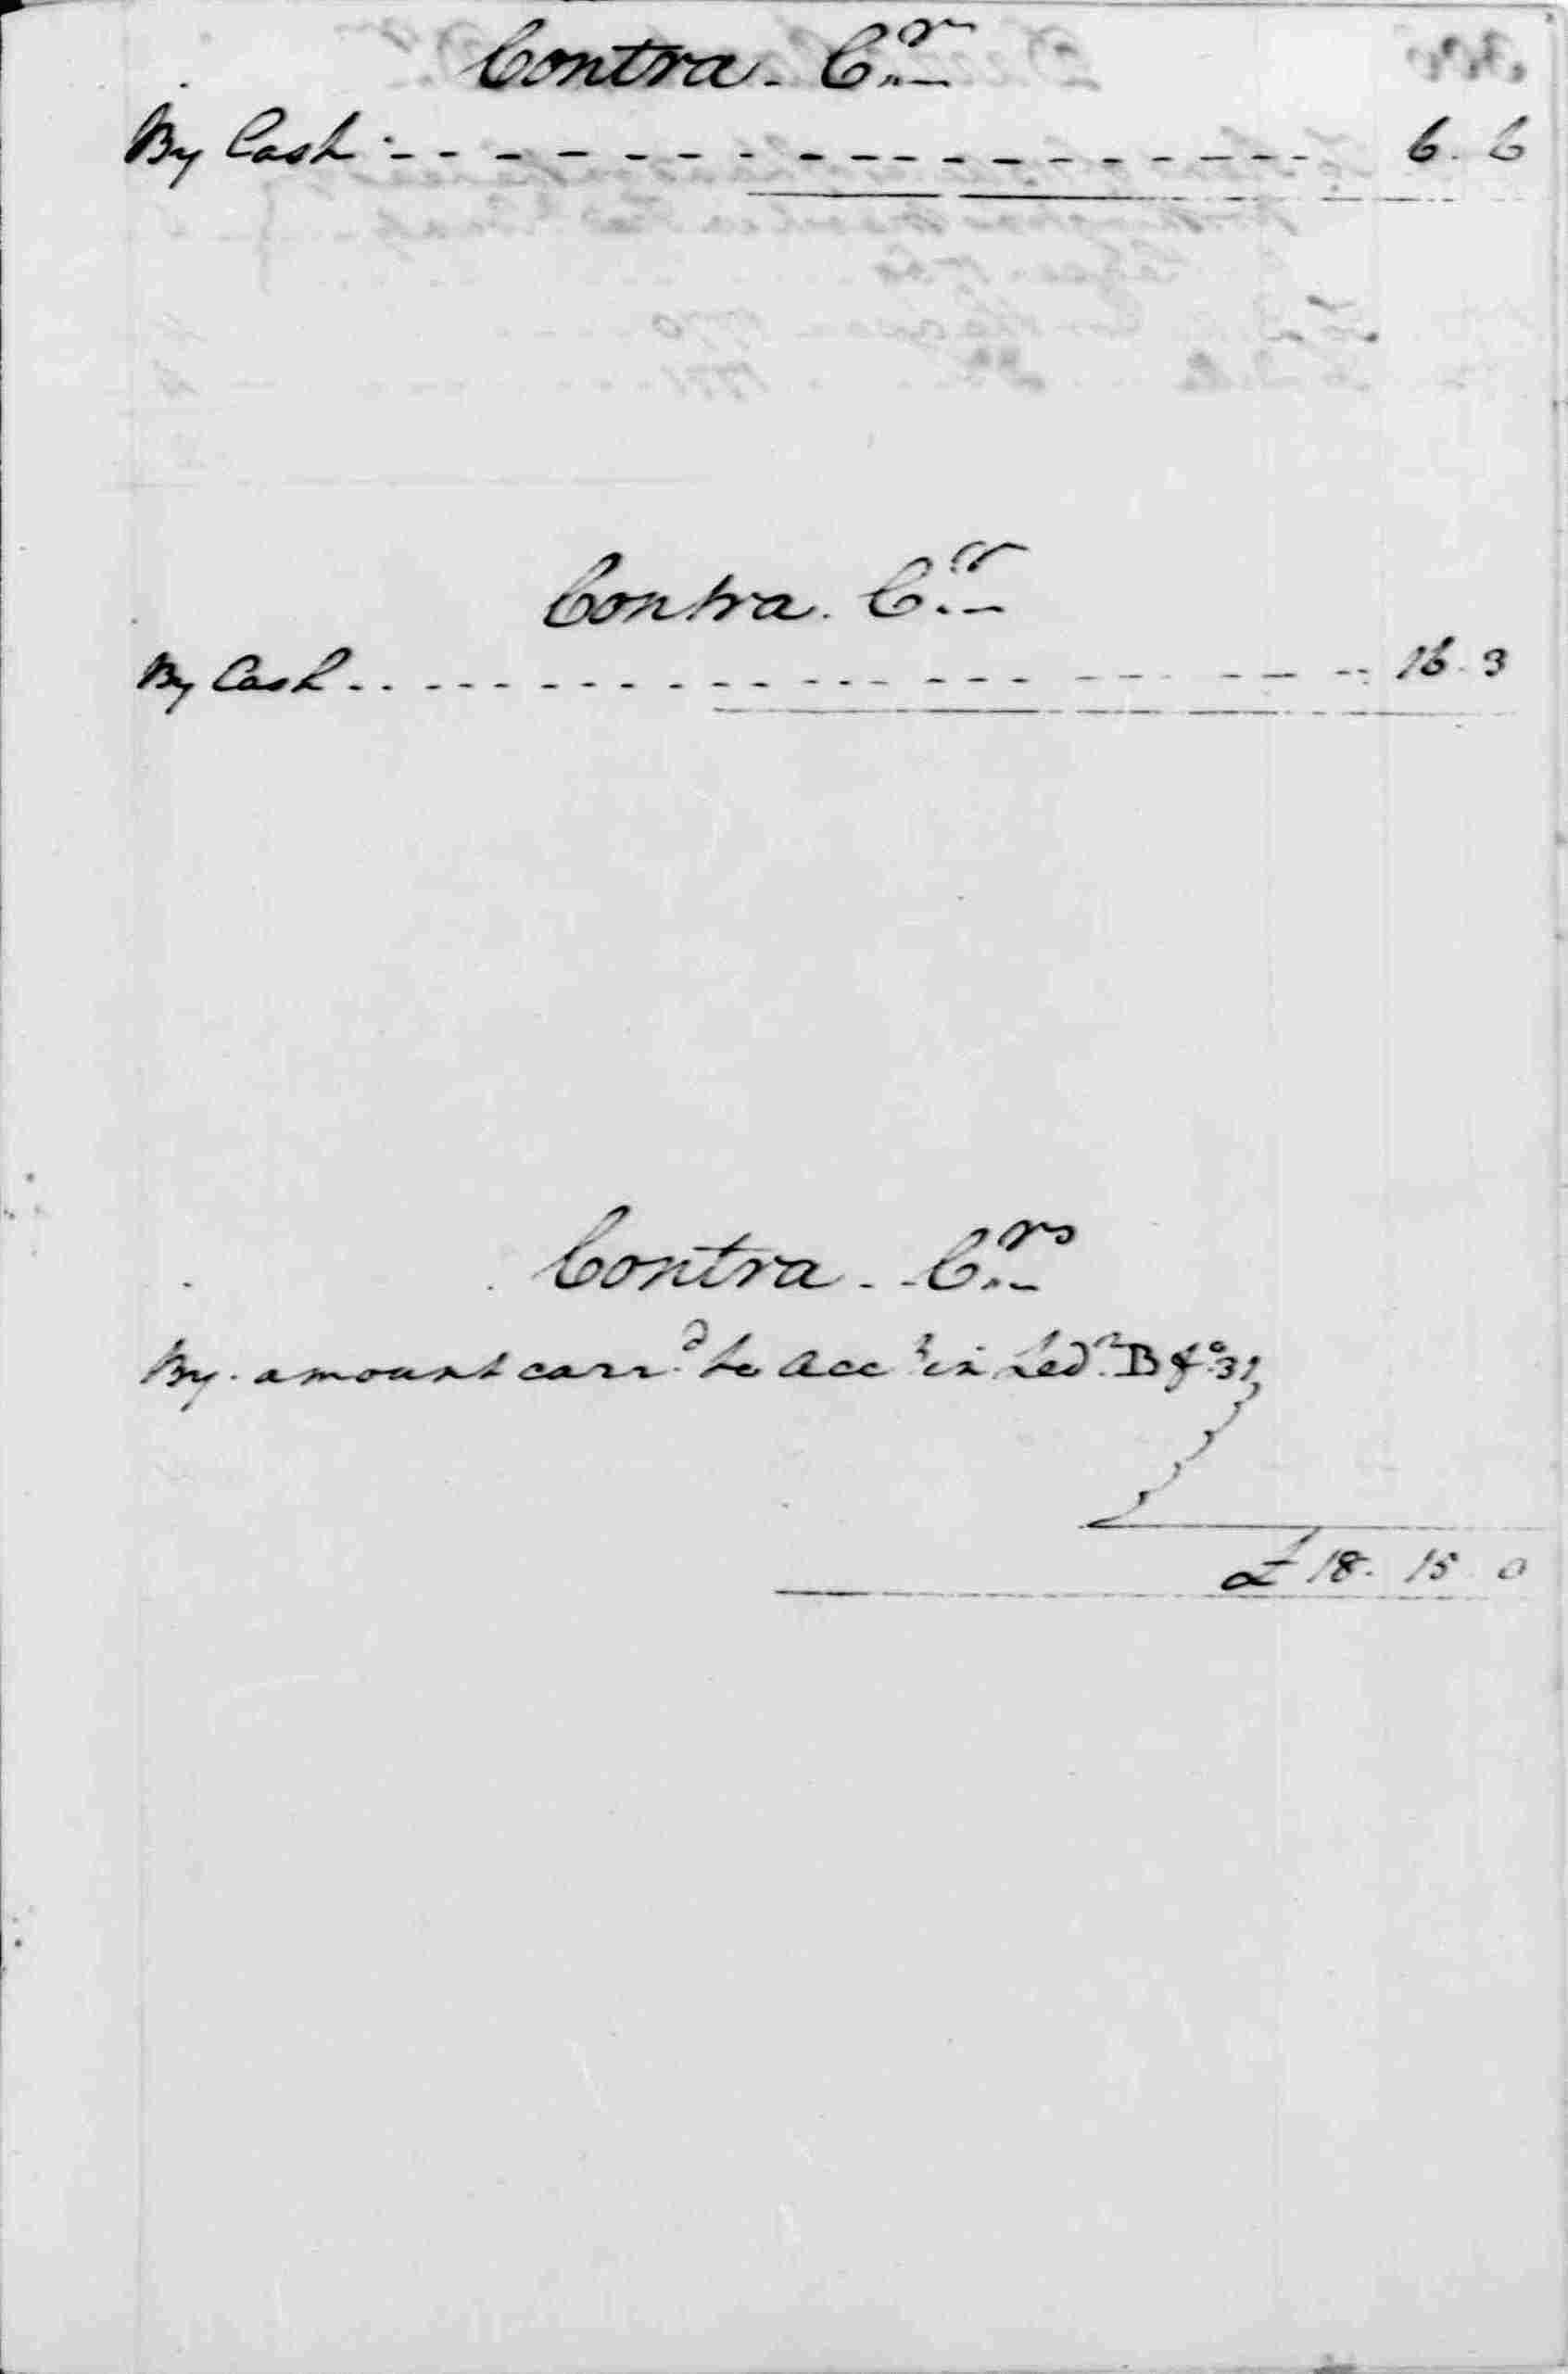 Ledger A, folio 305, right side